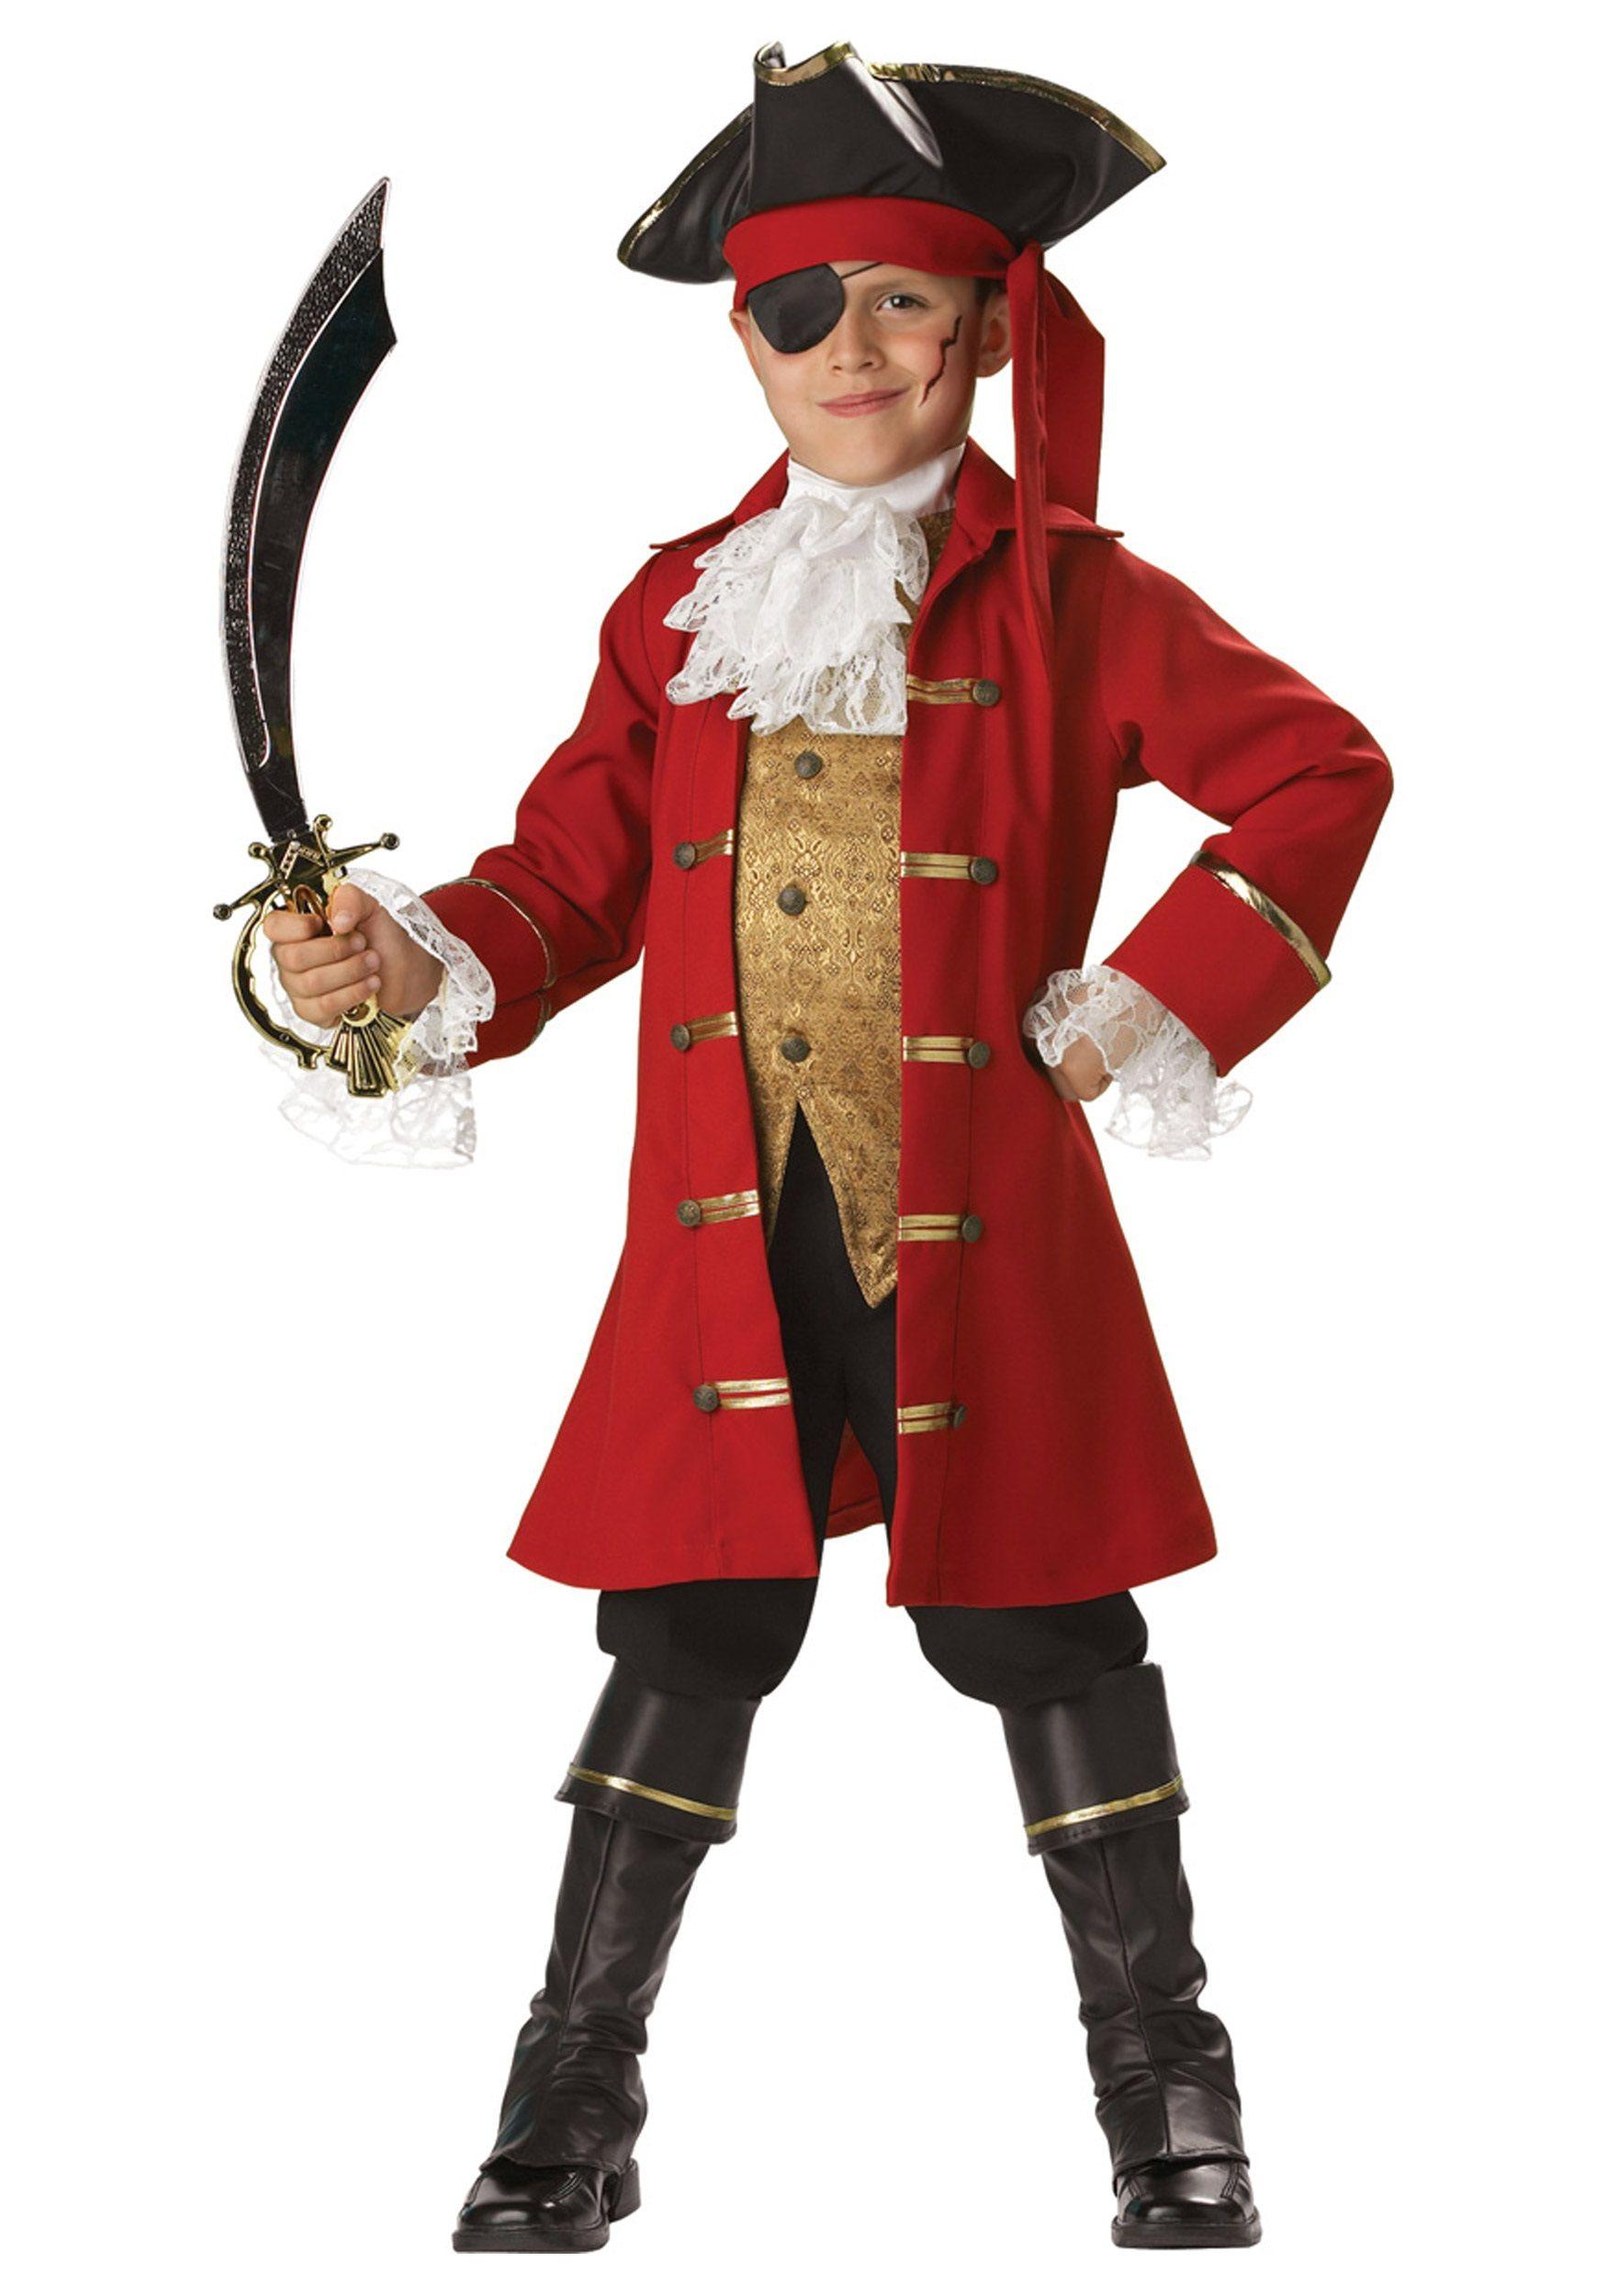 Pirate Captain Costume | Boys Halloween Costumes | Pinterest ...